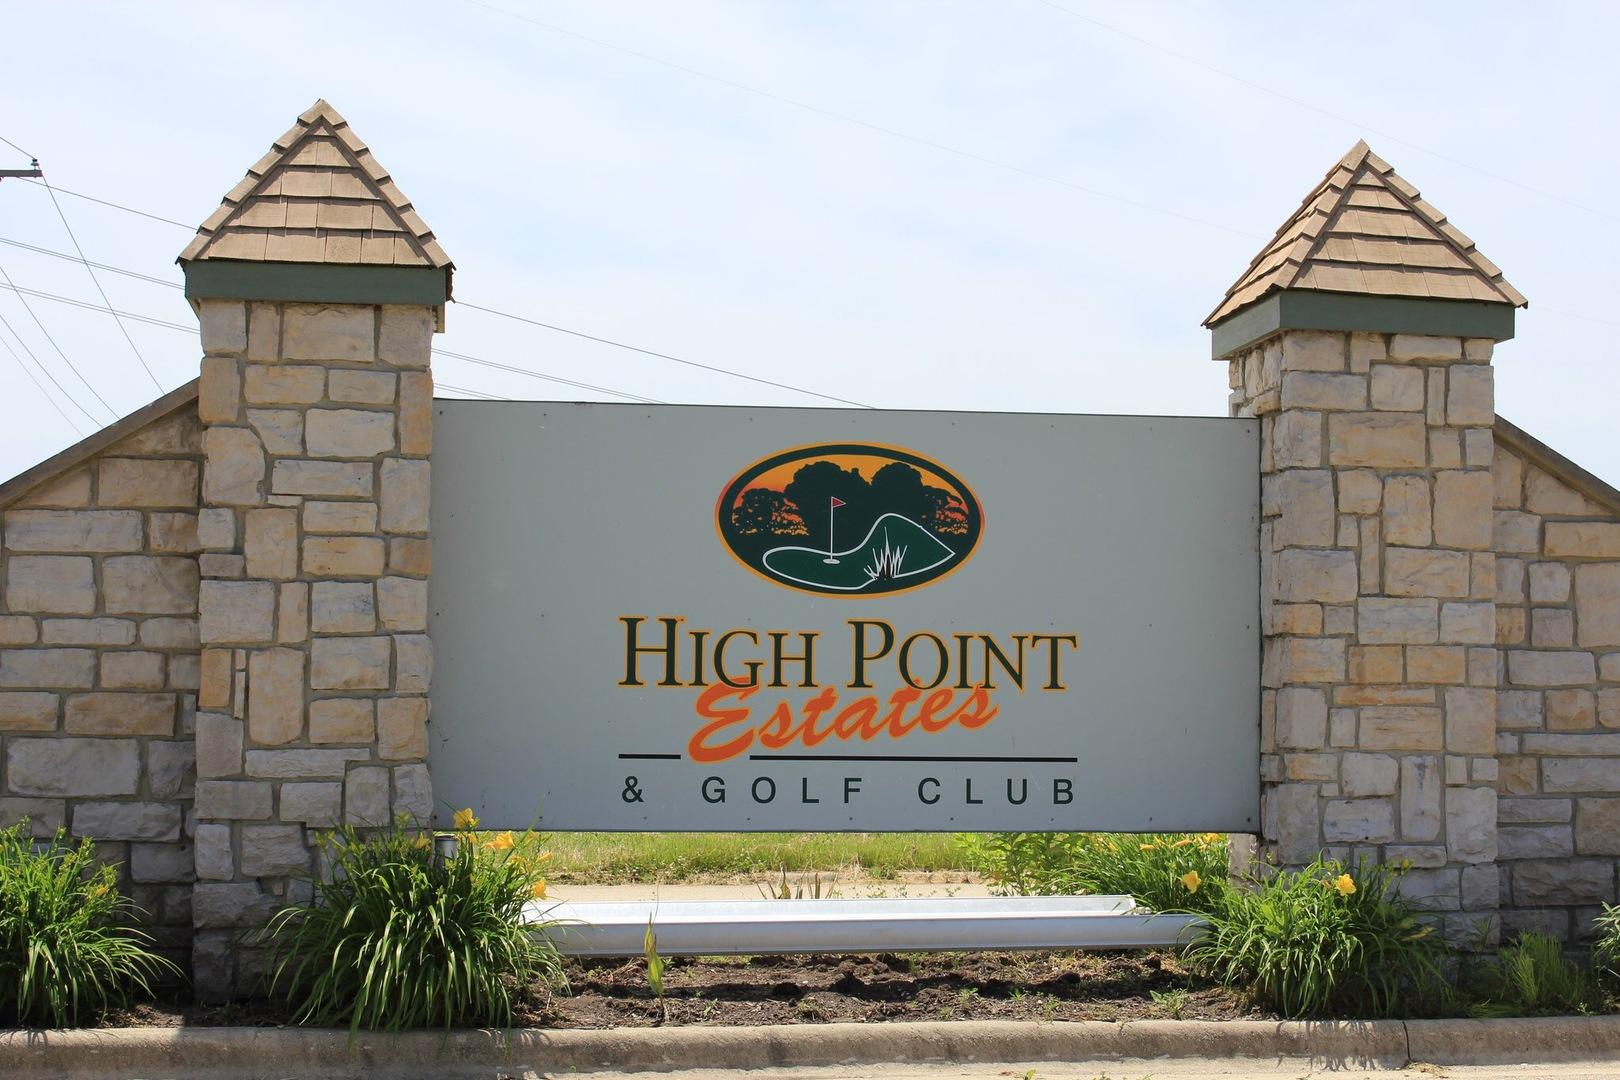 309 High Point ,Essex, Illinois 60935